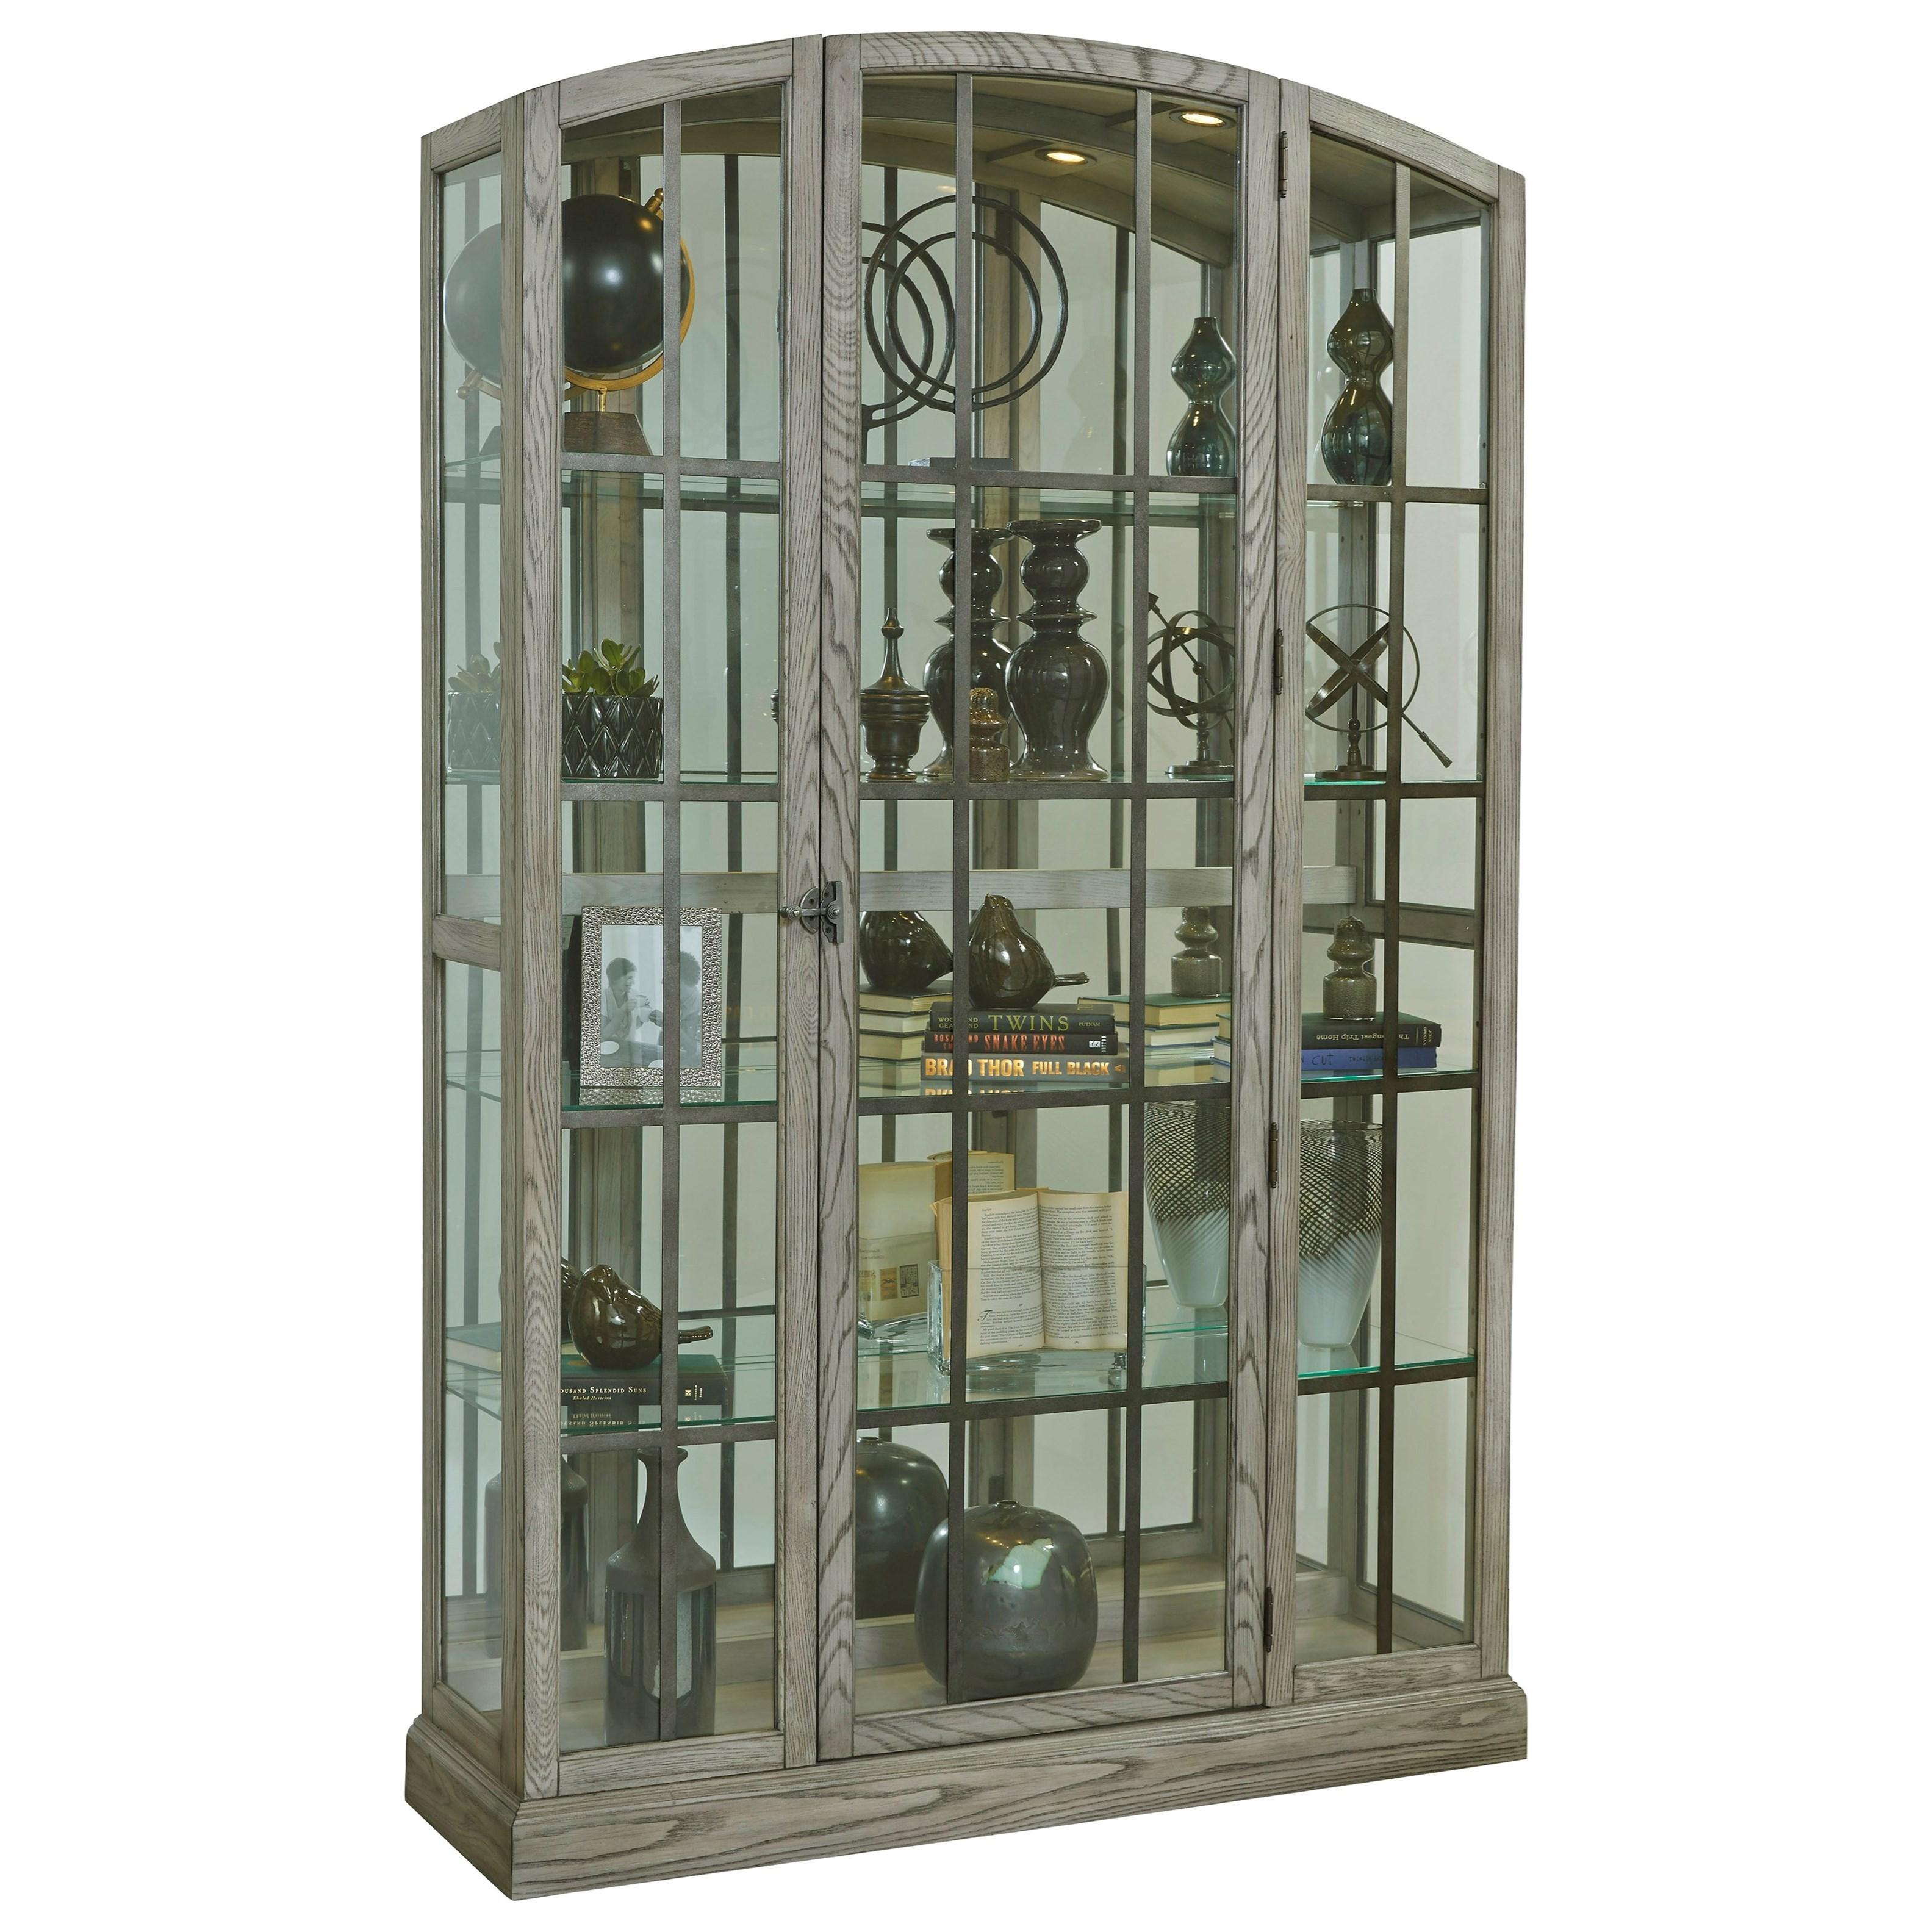 Curios Door Curio by Pulaski Furniture at Baer's Furniture